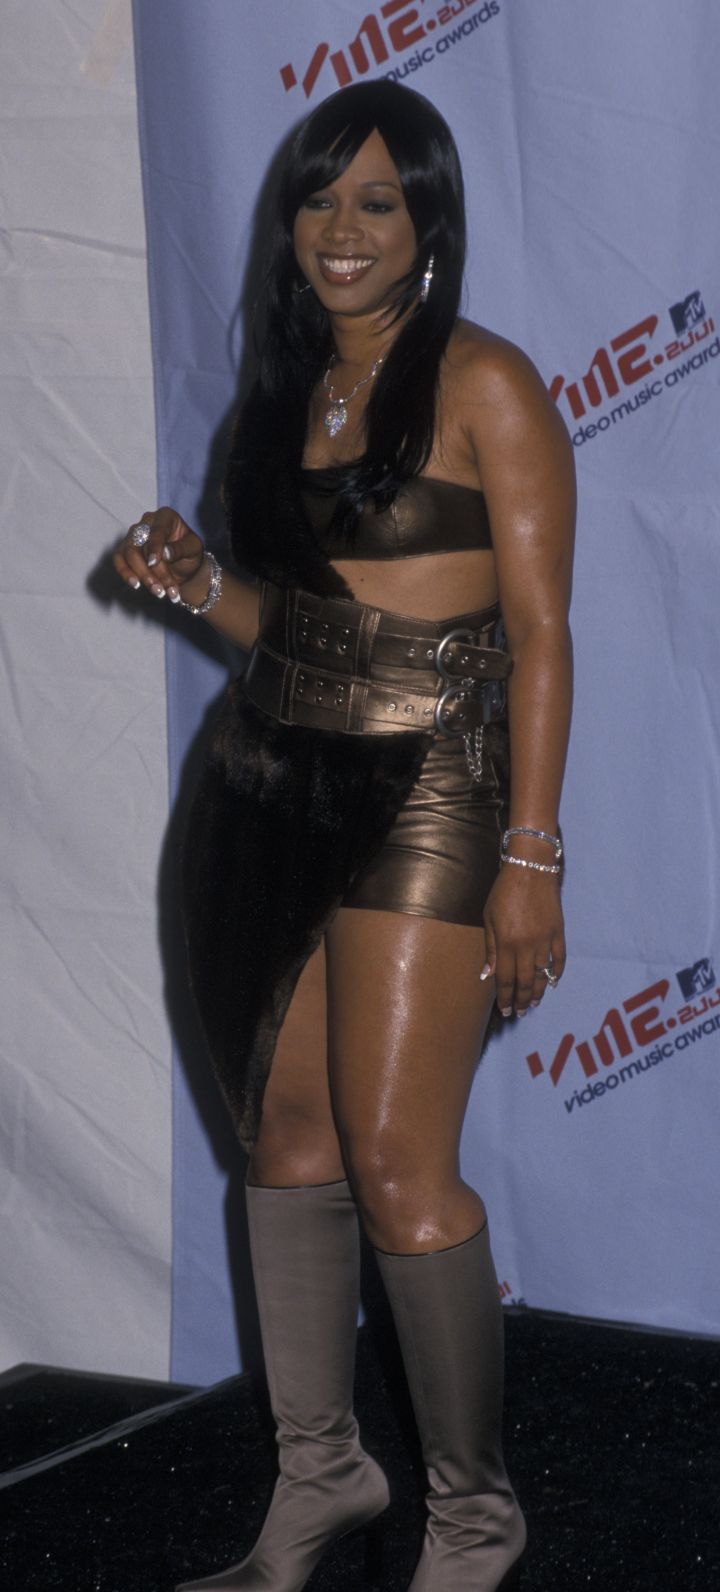 18th Annual MTV Video Music Awards